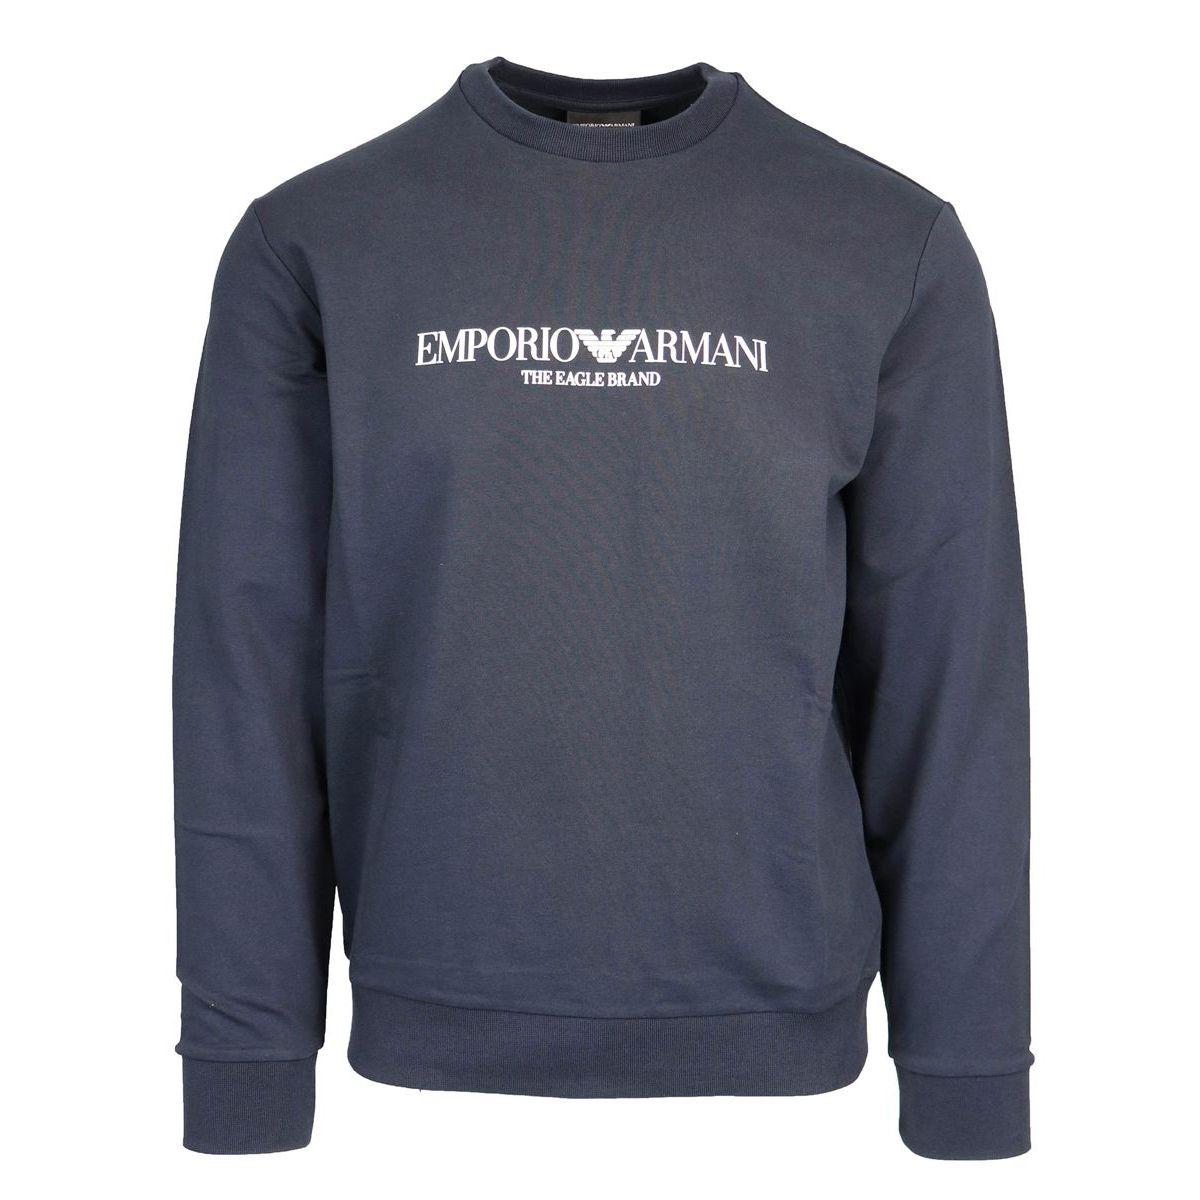 Crewneck sweatshirt with writing and logo Navy Emporio Armani